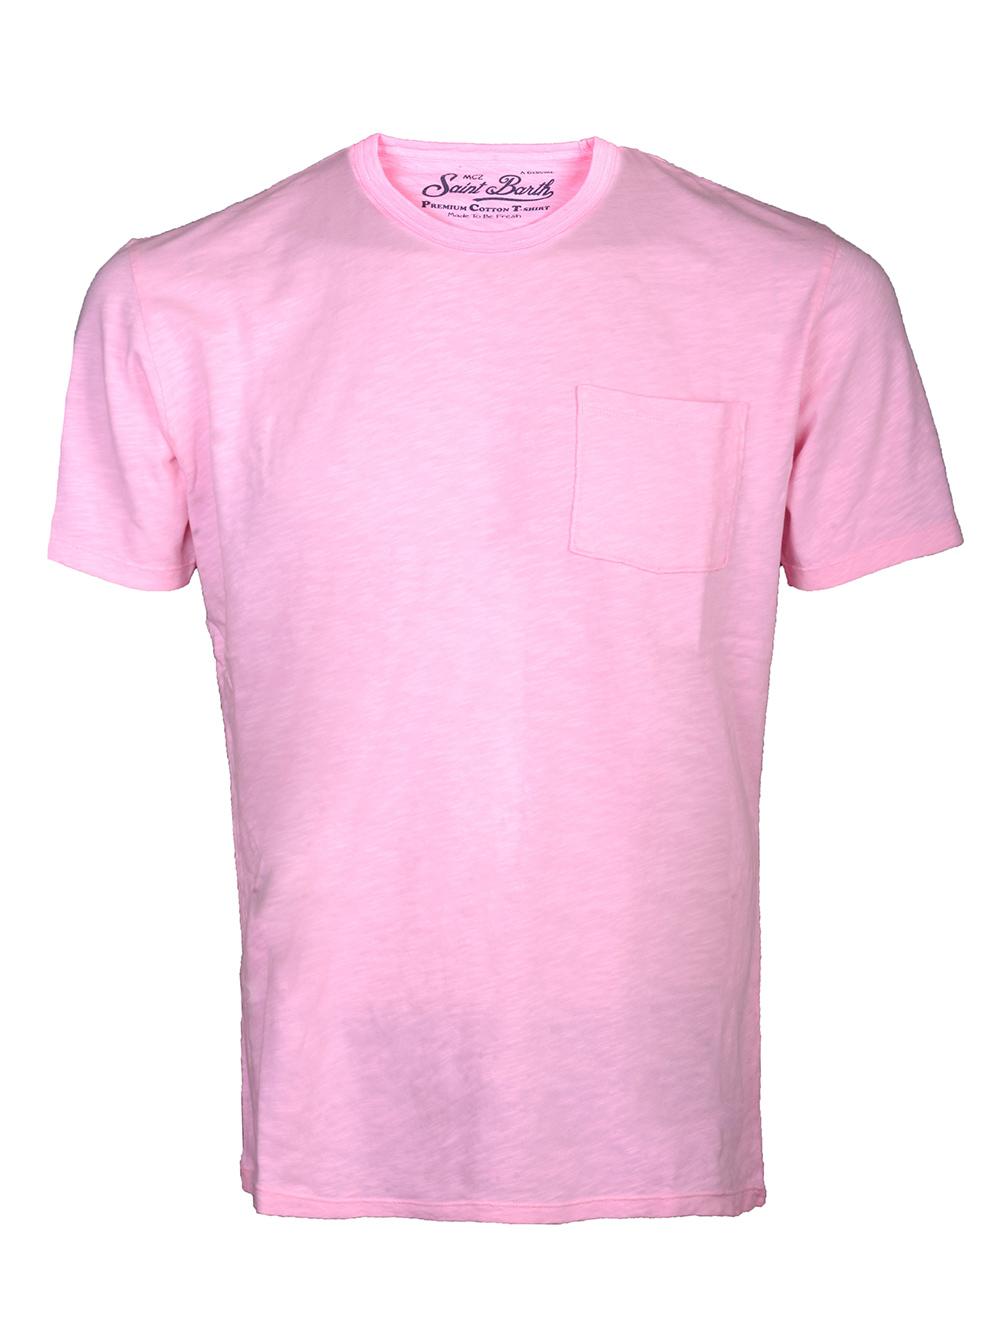 Mc2 St.BarthSALT WATER Μπλούζα t-shirt PRE0001 ΡΟΖ